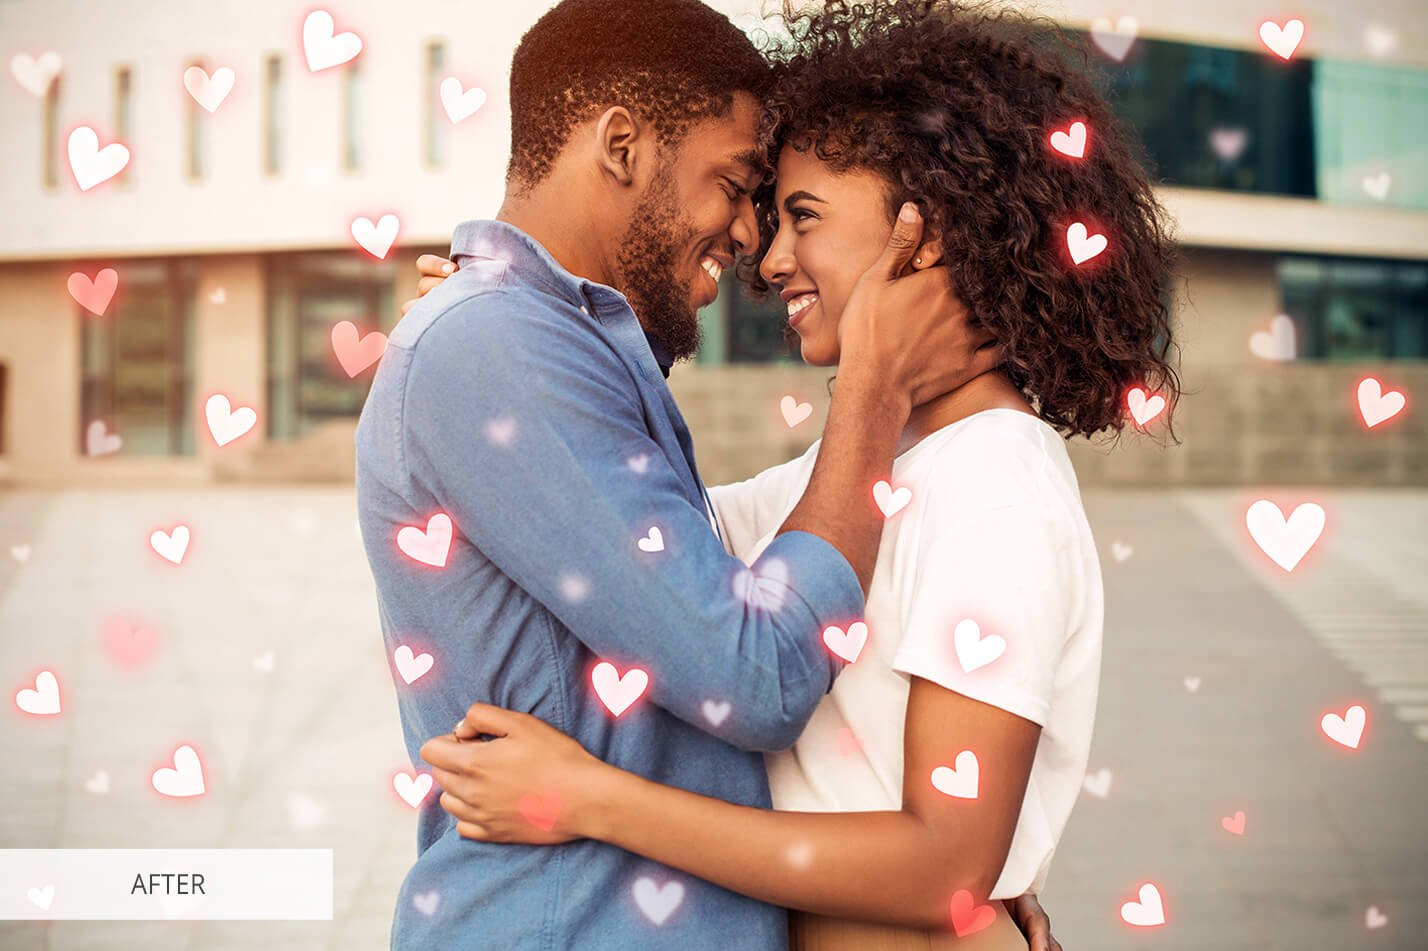 30款高清心形PS叠加层PNG免抠图片素材 Heart Photoshop Overlays插图(28)